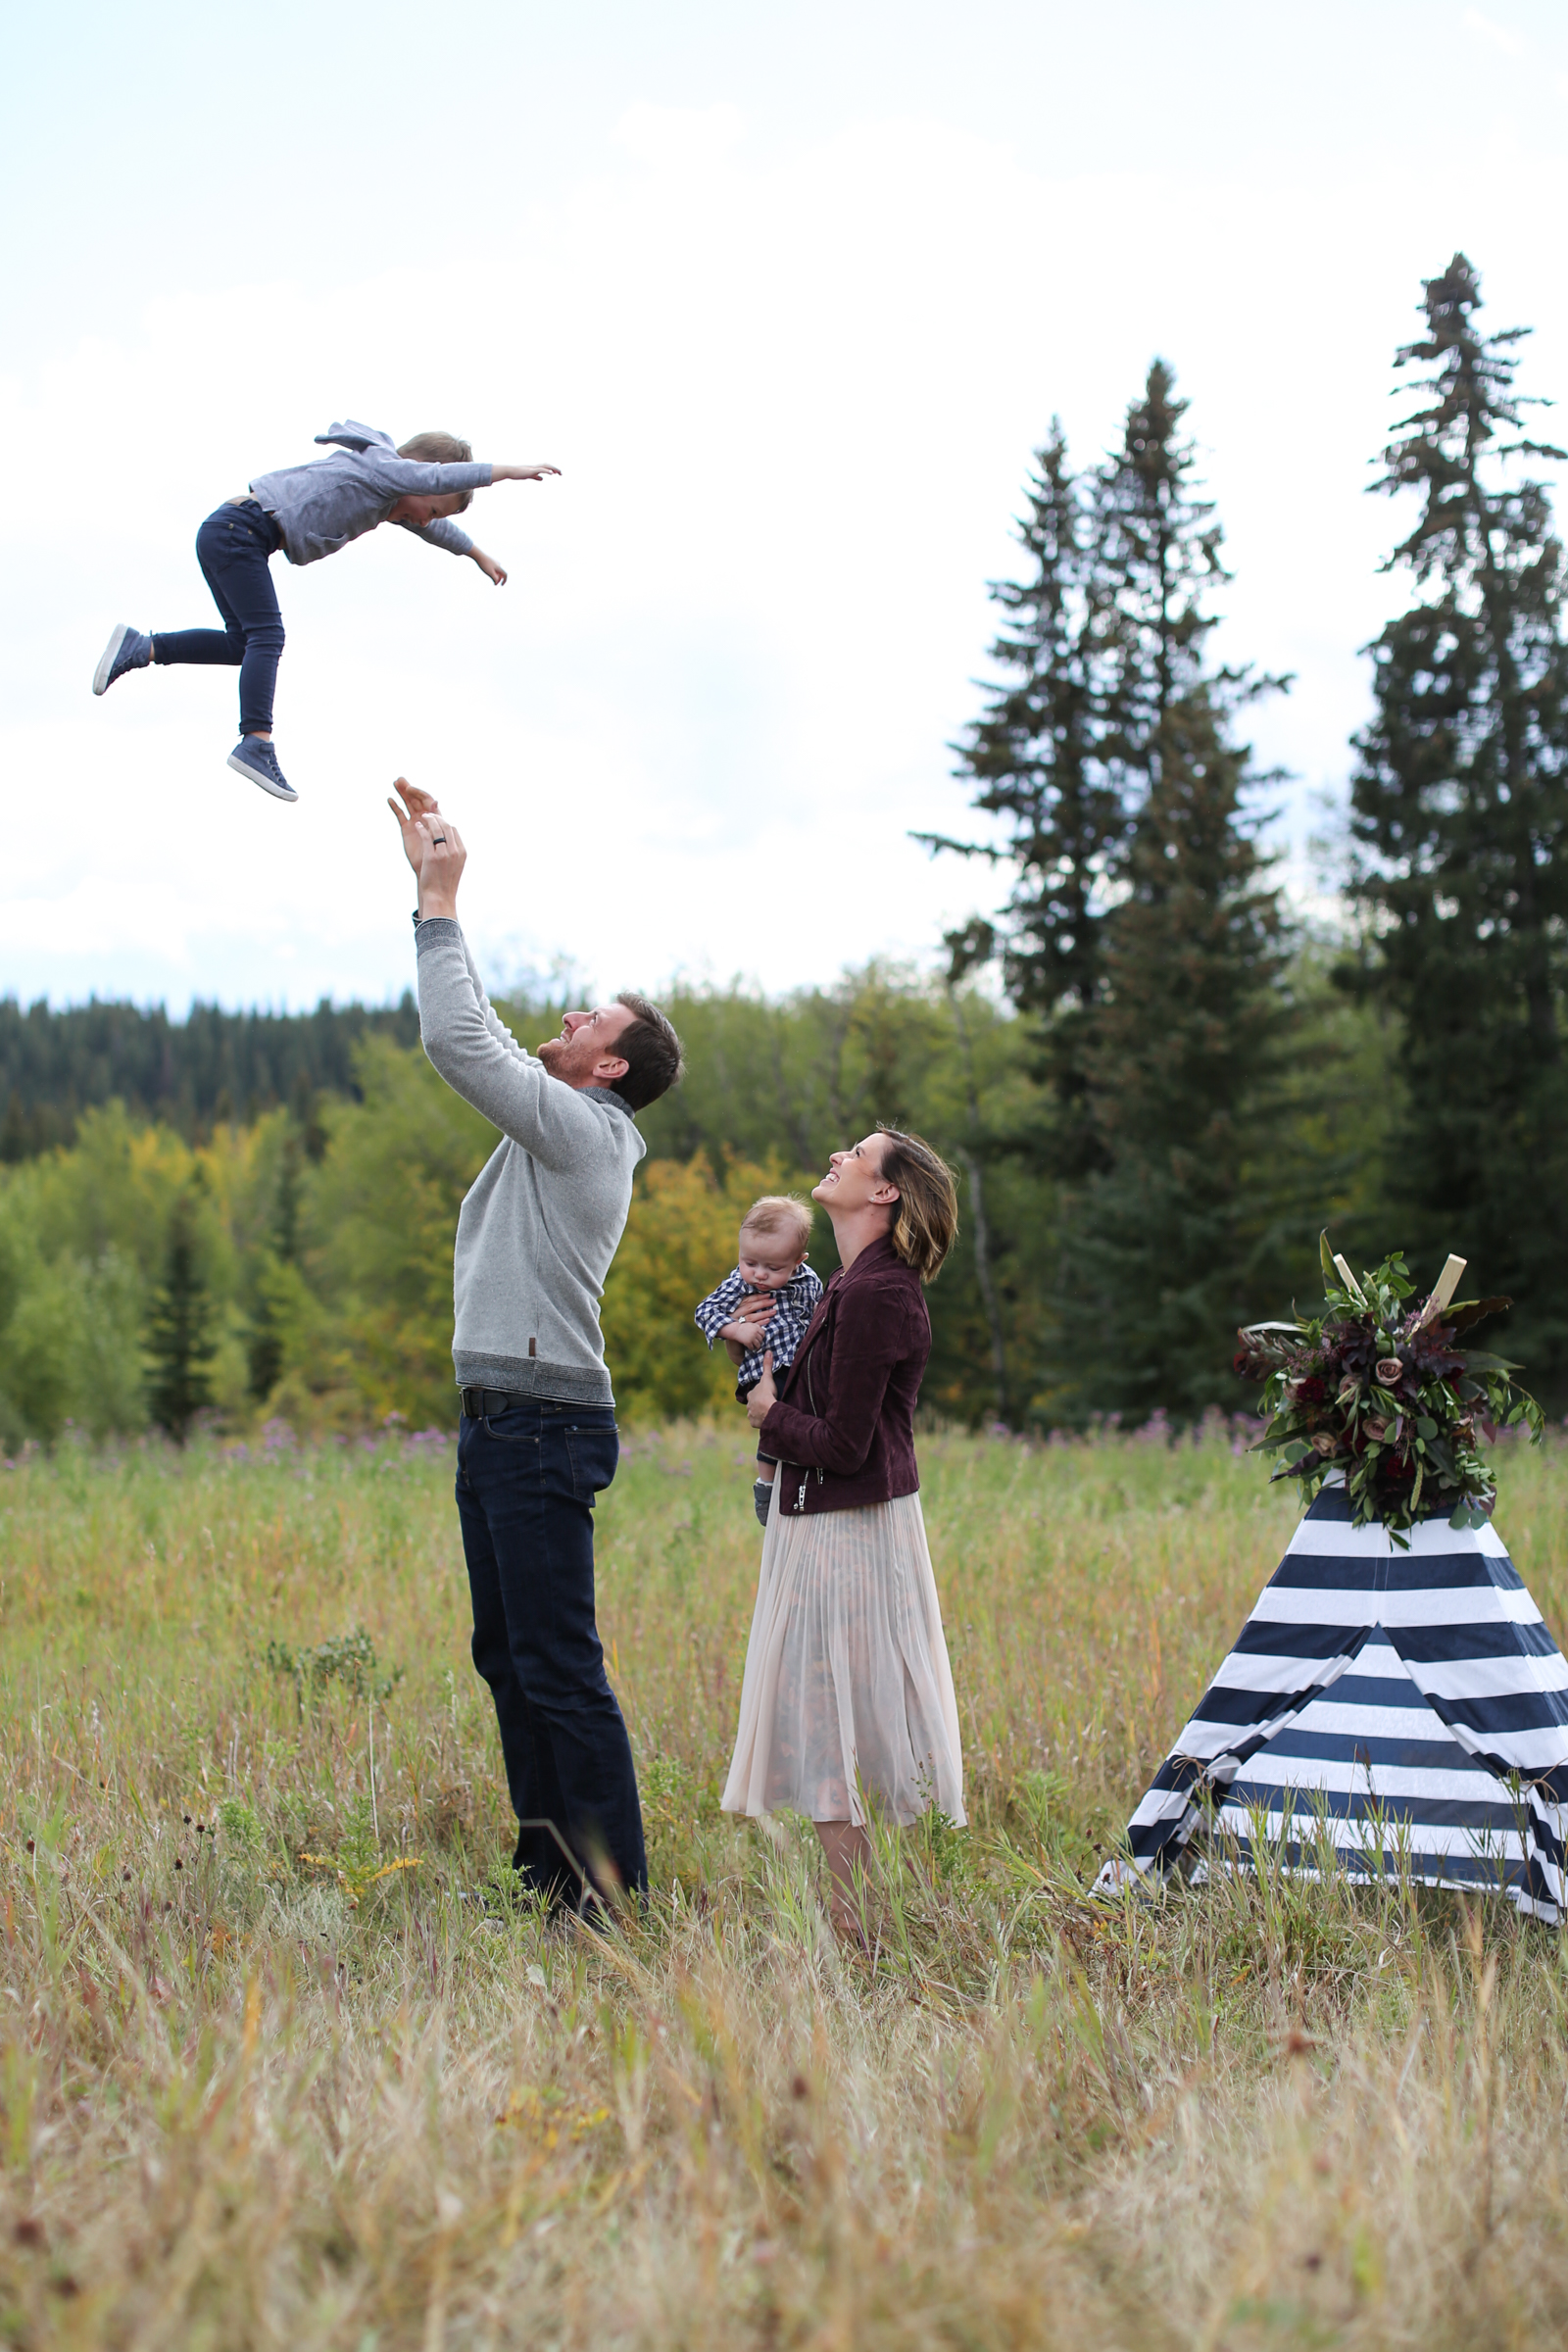 Fall-Family-Creative-Lindsay_Skeans_Photography-15.jpg